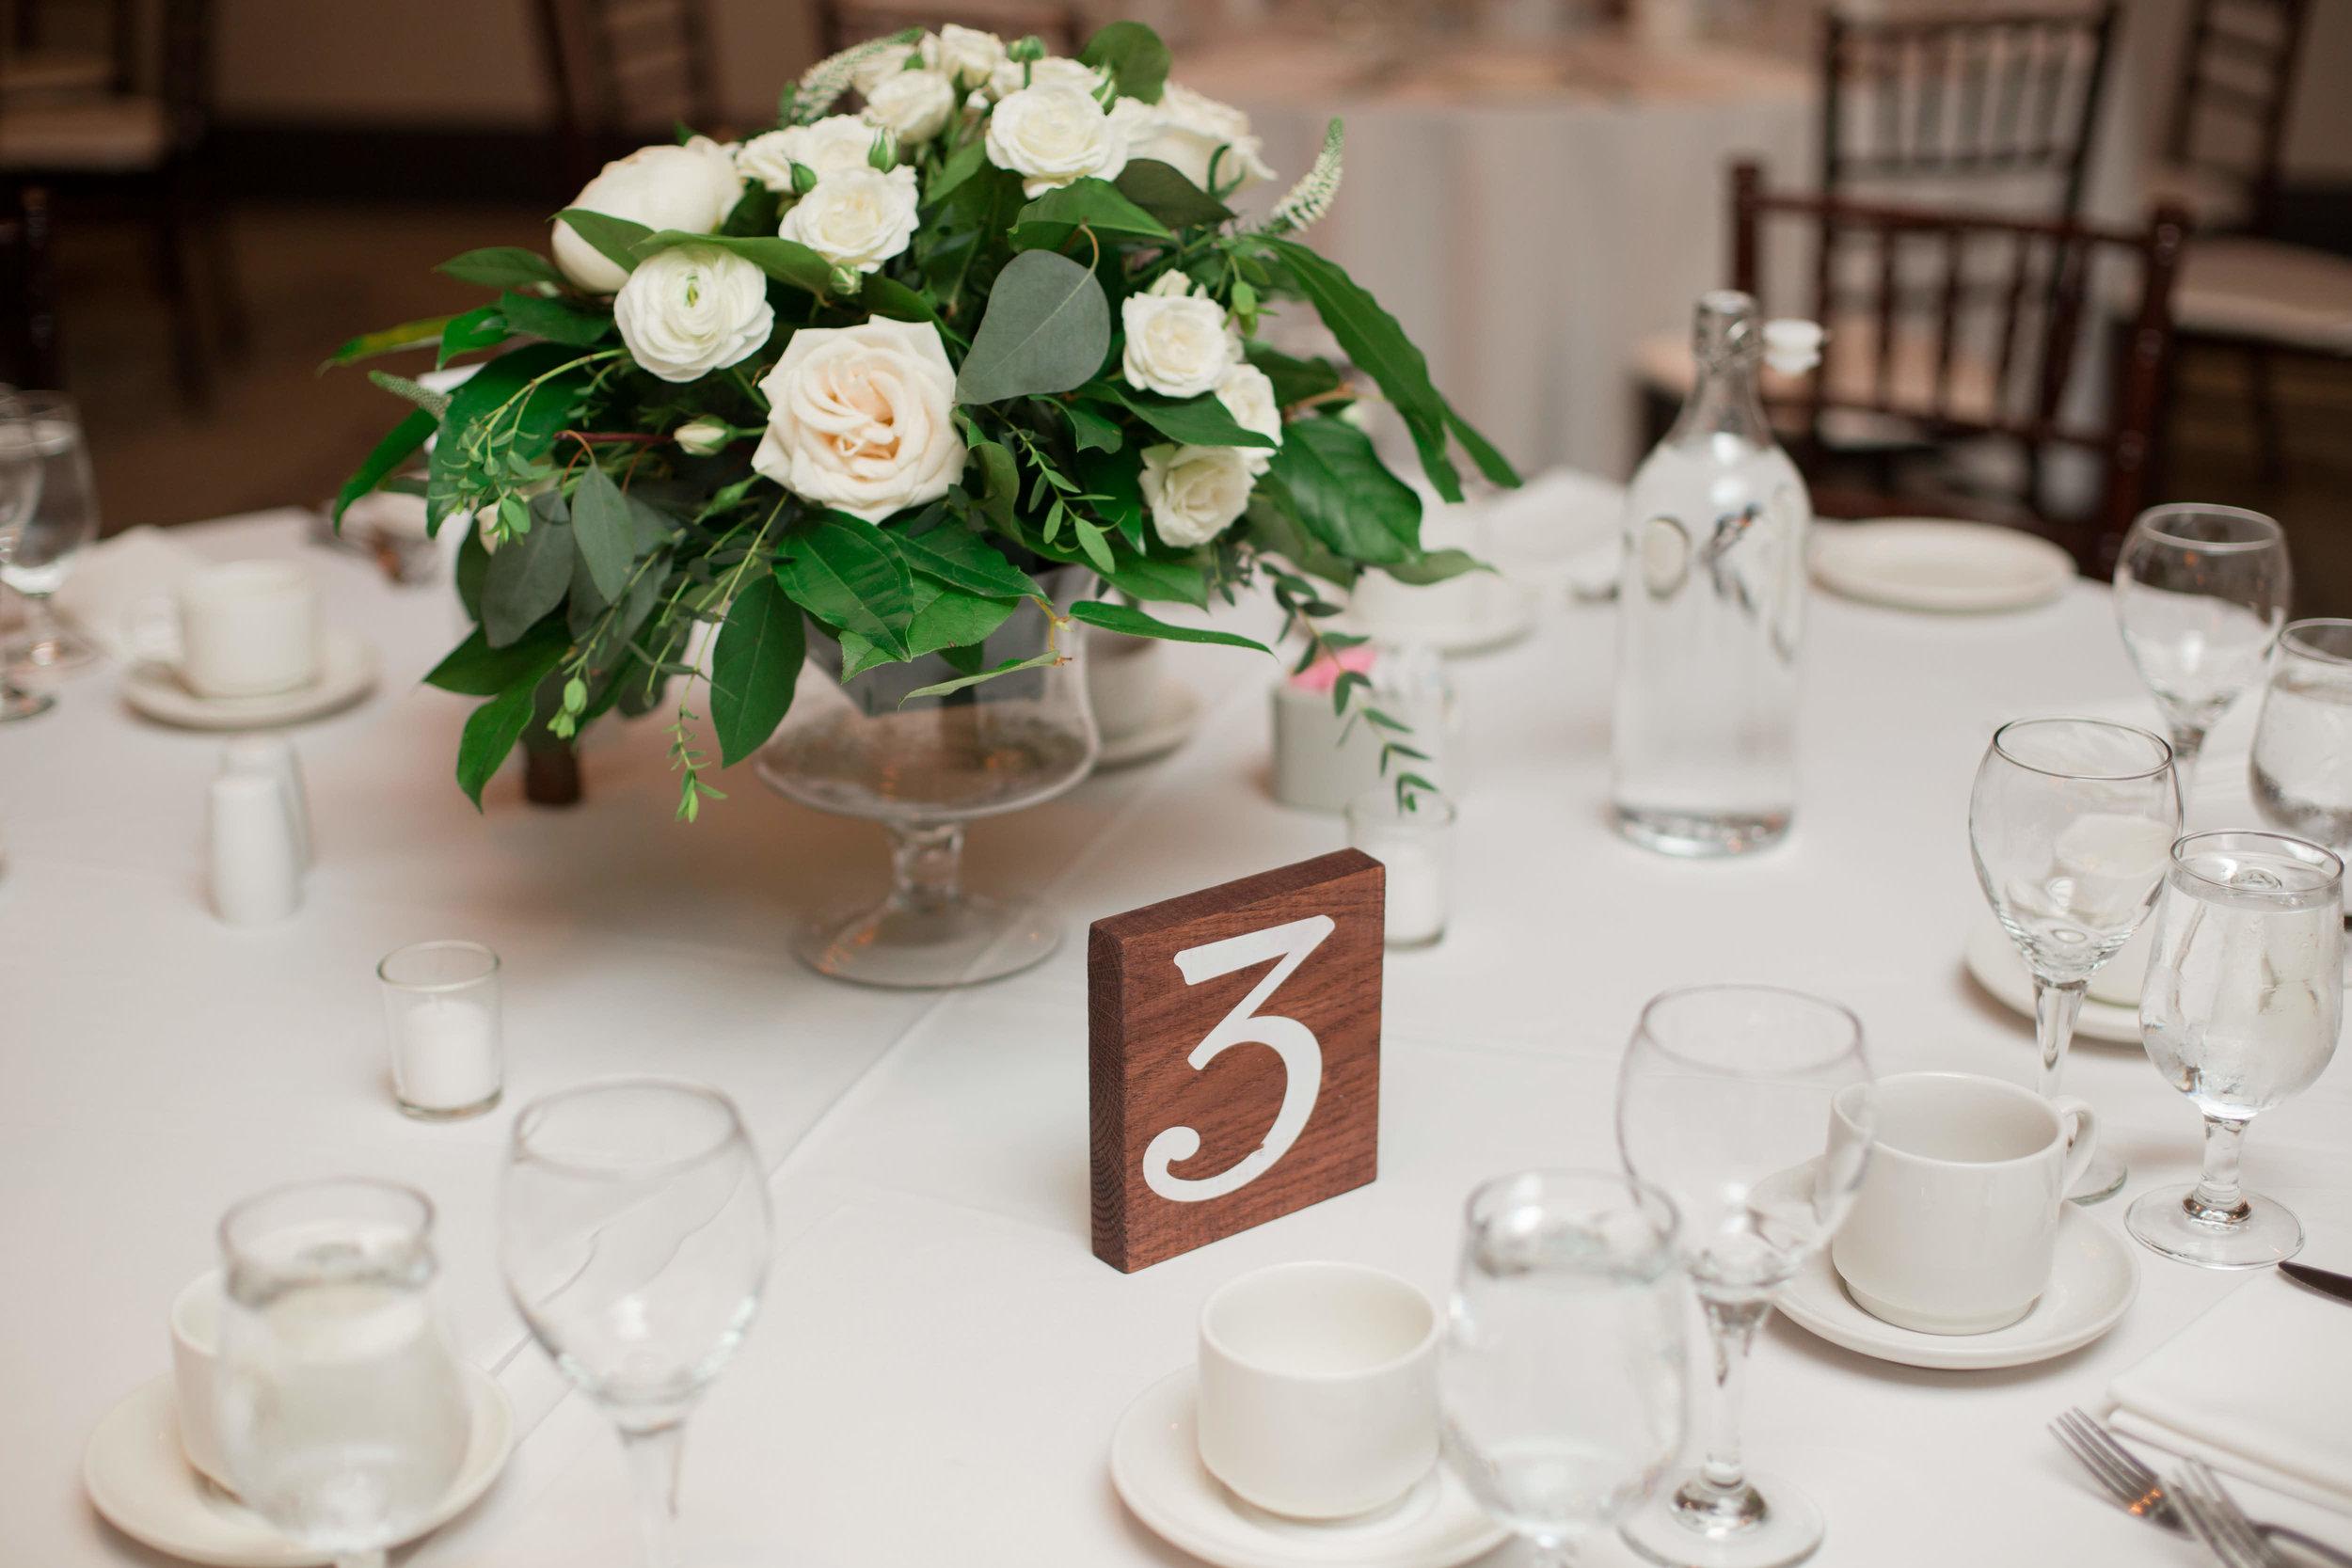 Miranda___Daniel___Daniel_Ricci_Weddings___High_Res._Finals_171.jpg